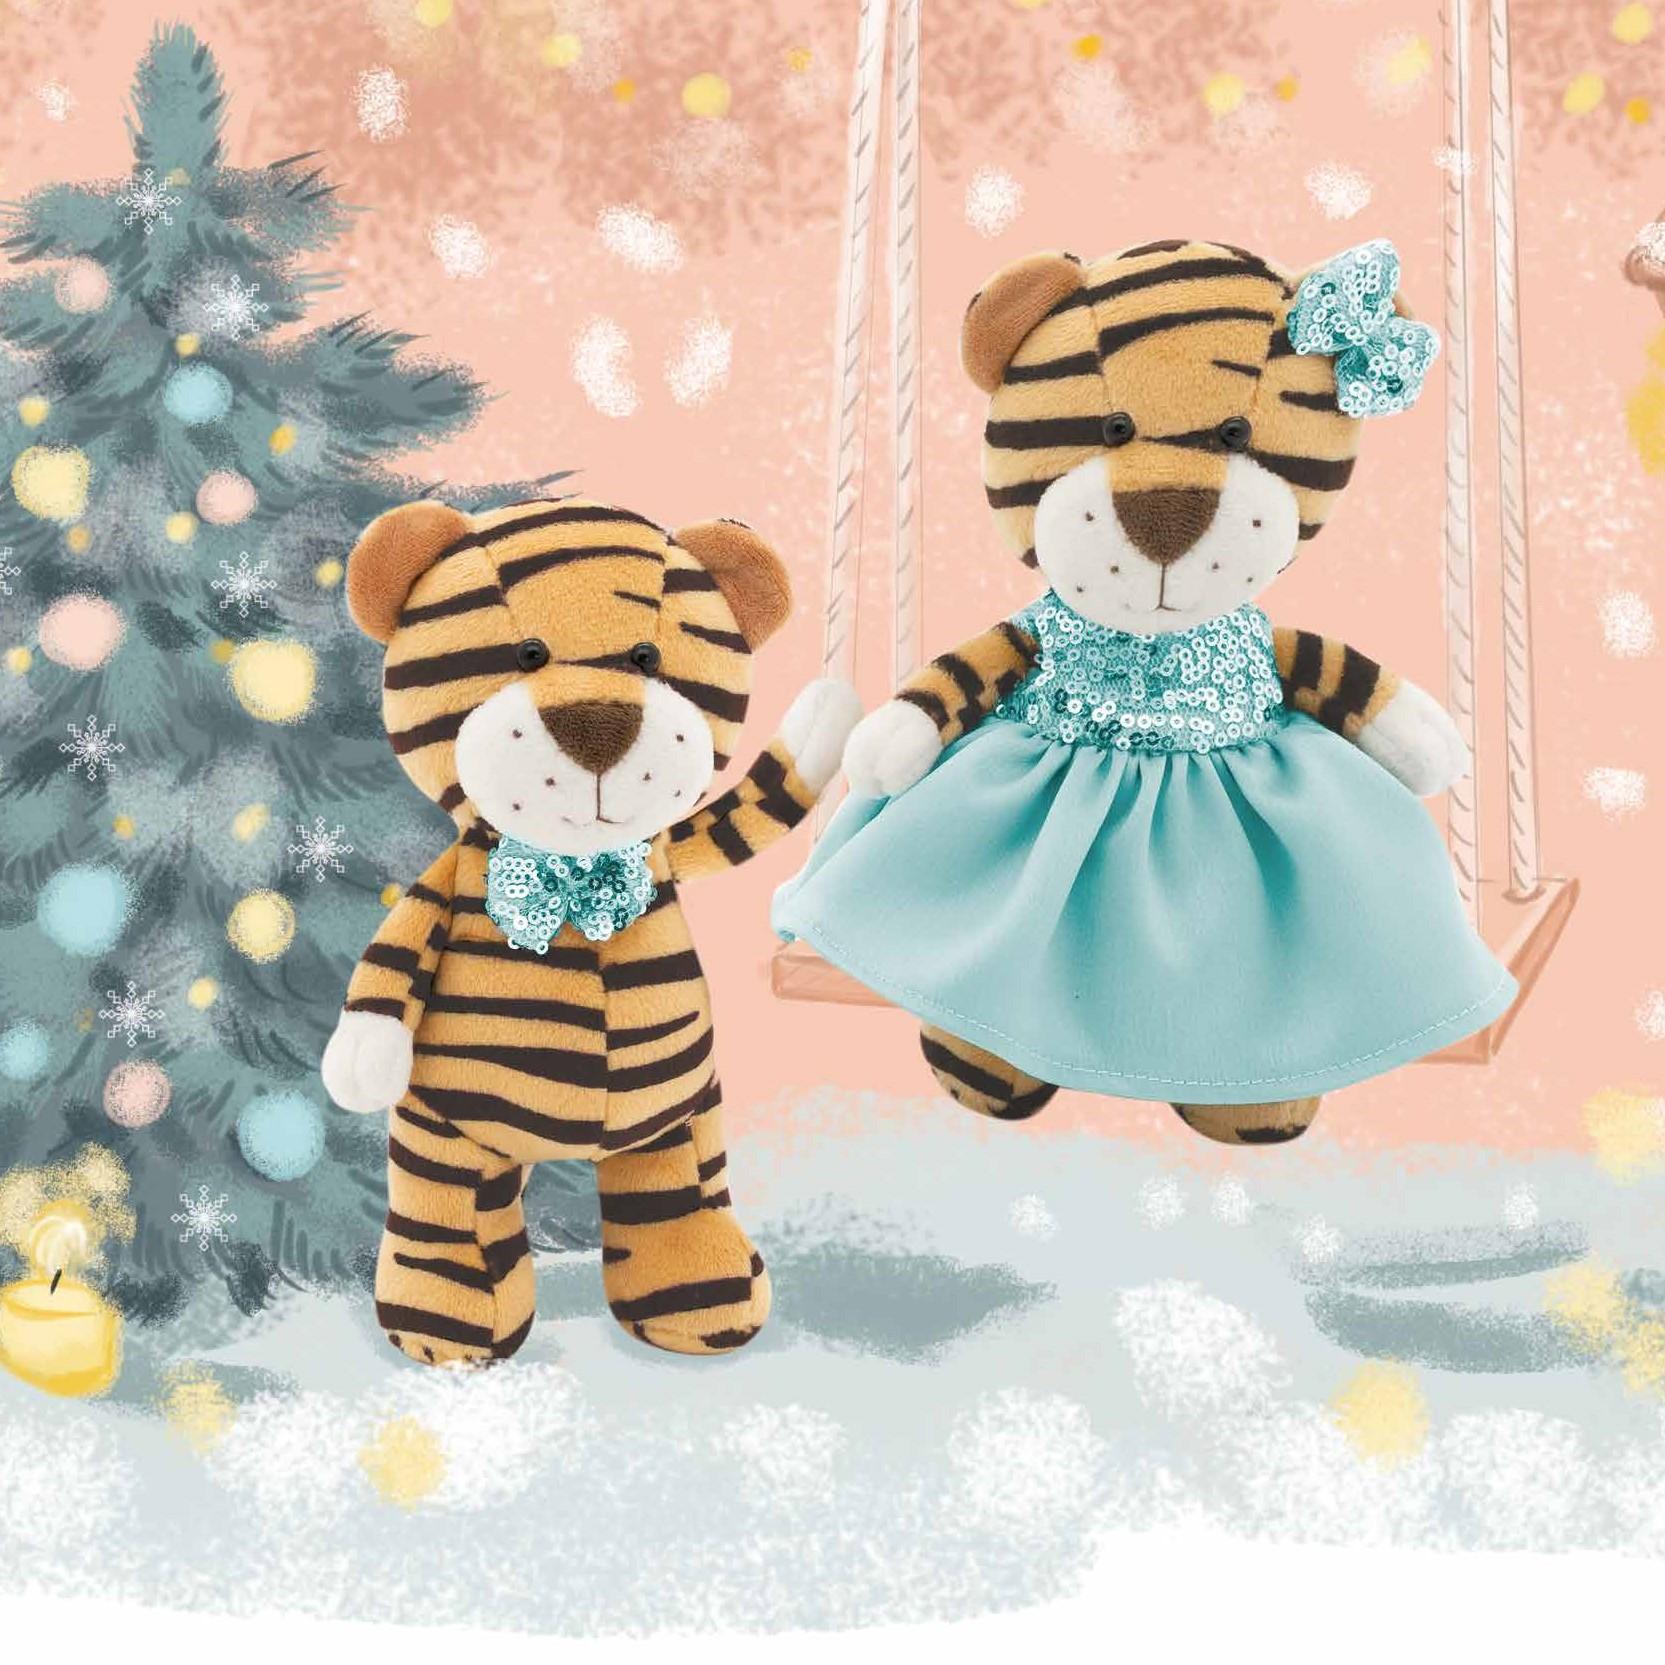 игрушки символы года тигры оранж тойс 2022